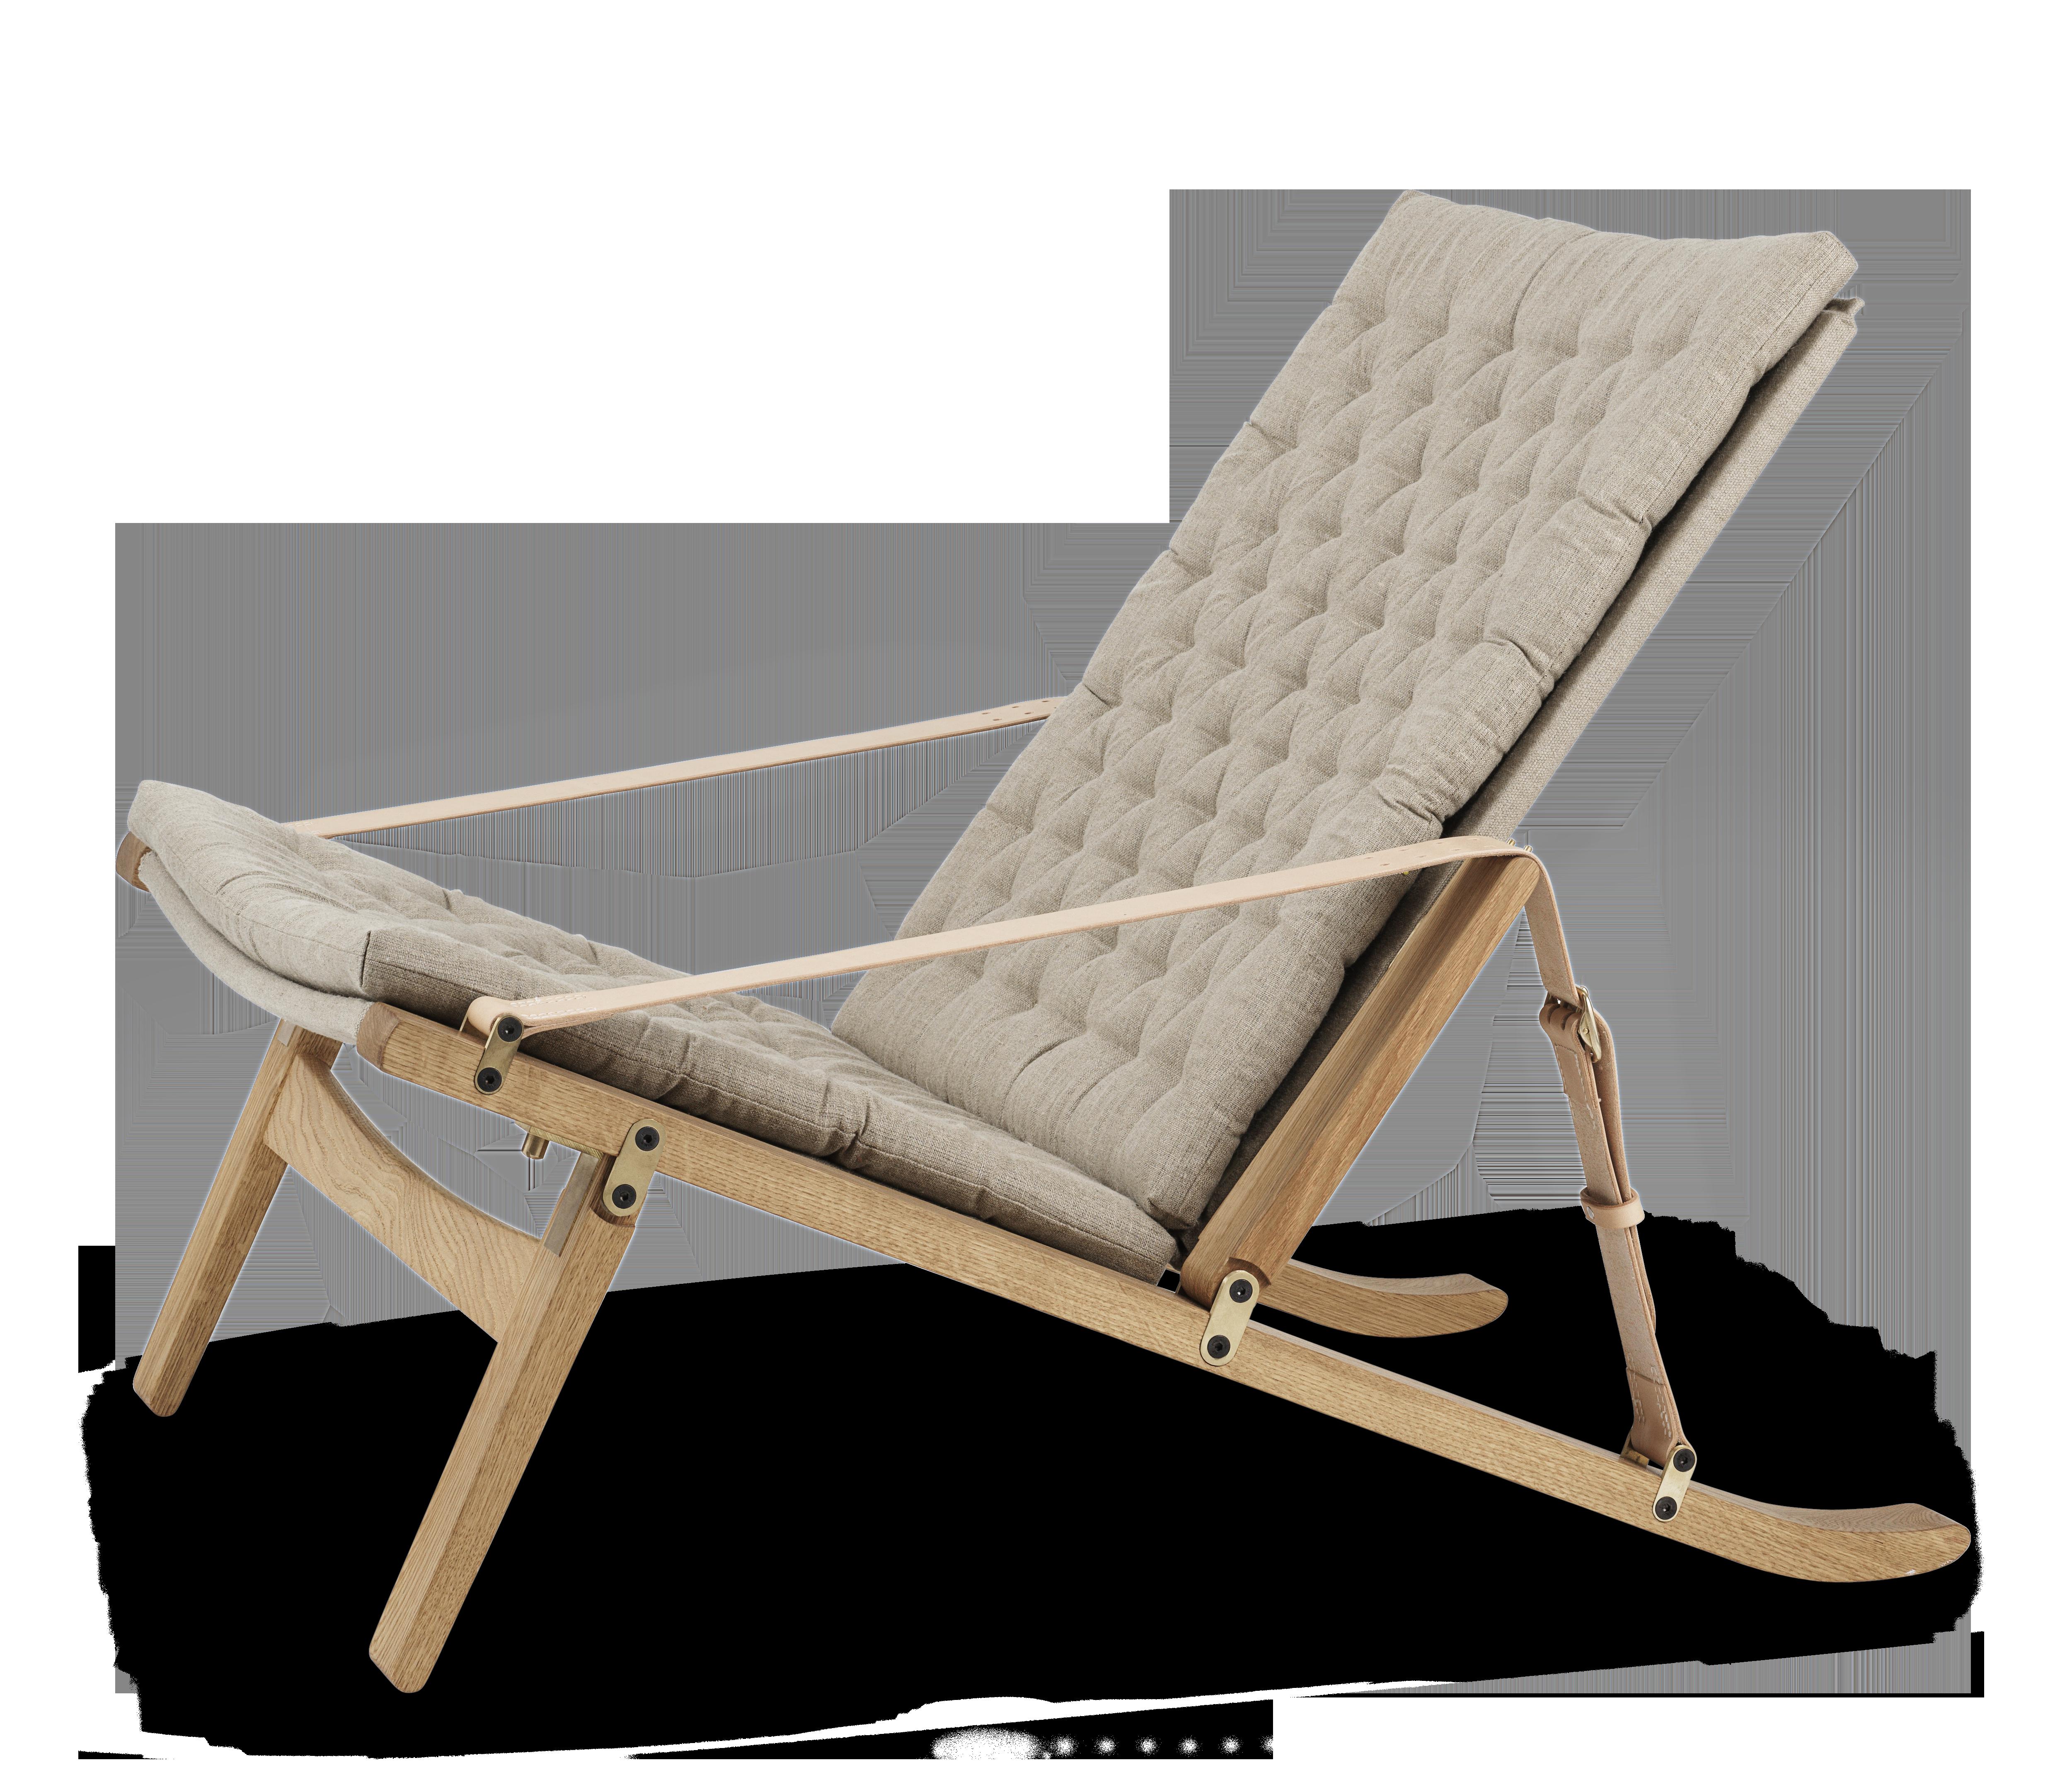 FK11 | Plico chair